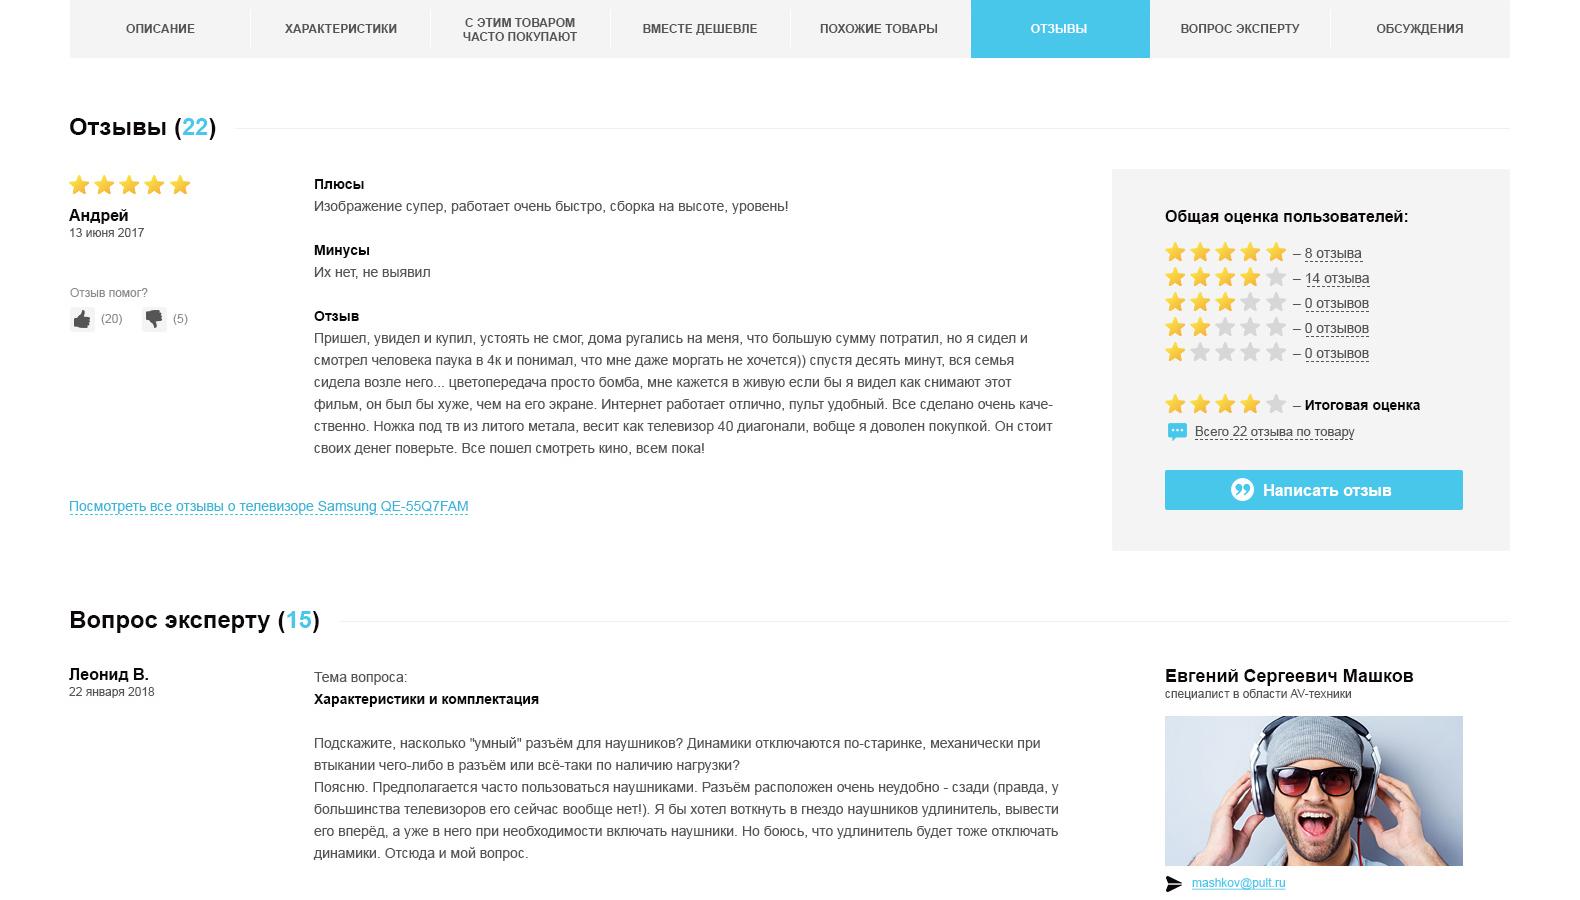 Дизайн 2ух страниц сайта PULT.ru фото f_8945b0d98041596b.jpg